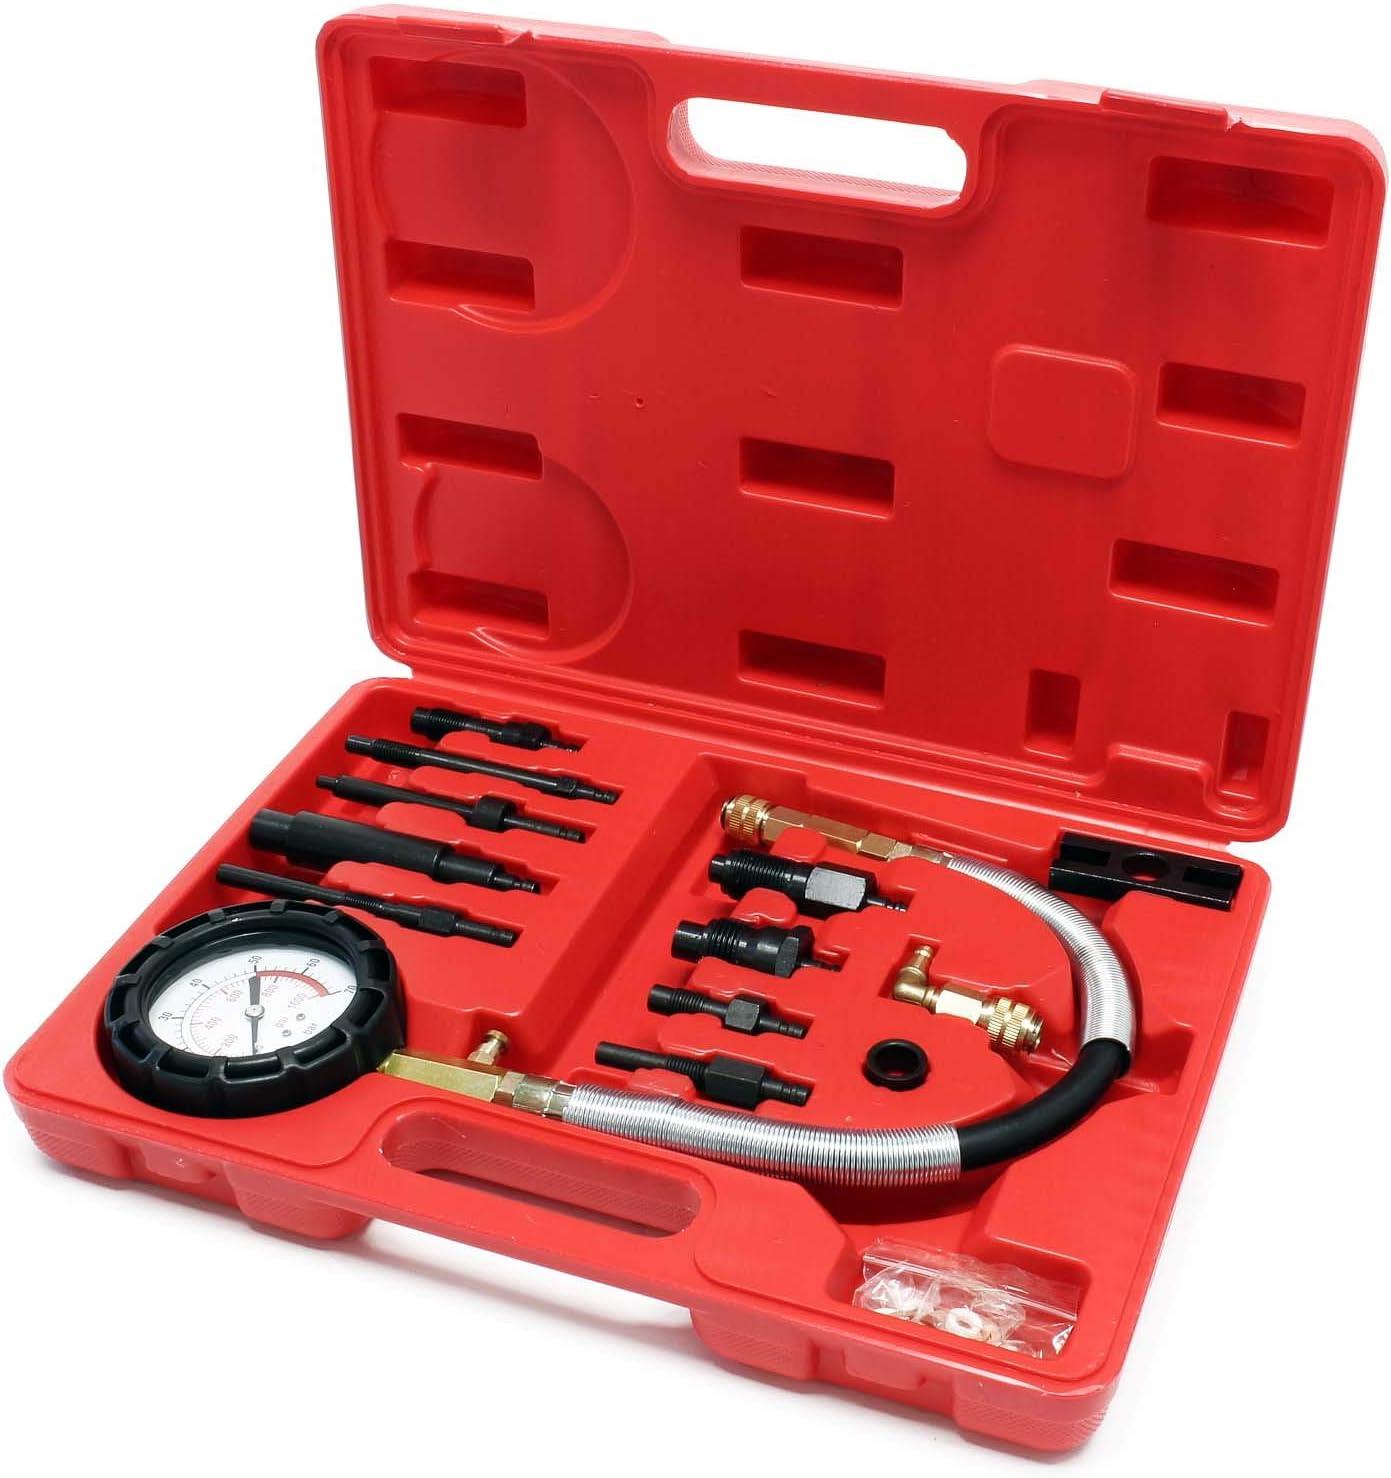 Engine Oil Pressure Tester Pressure Gauge Test Tool Kit Diesel 0-100psi 12pcs